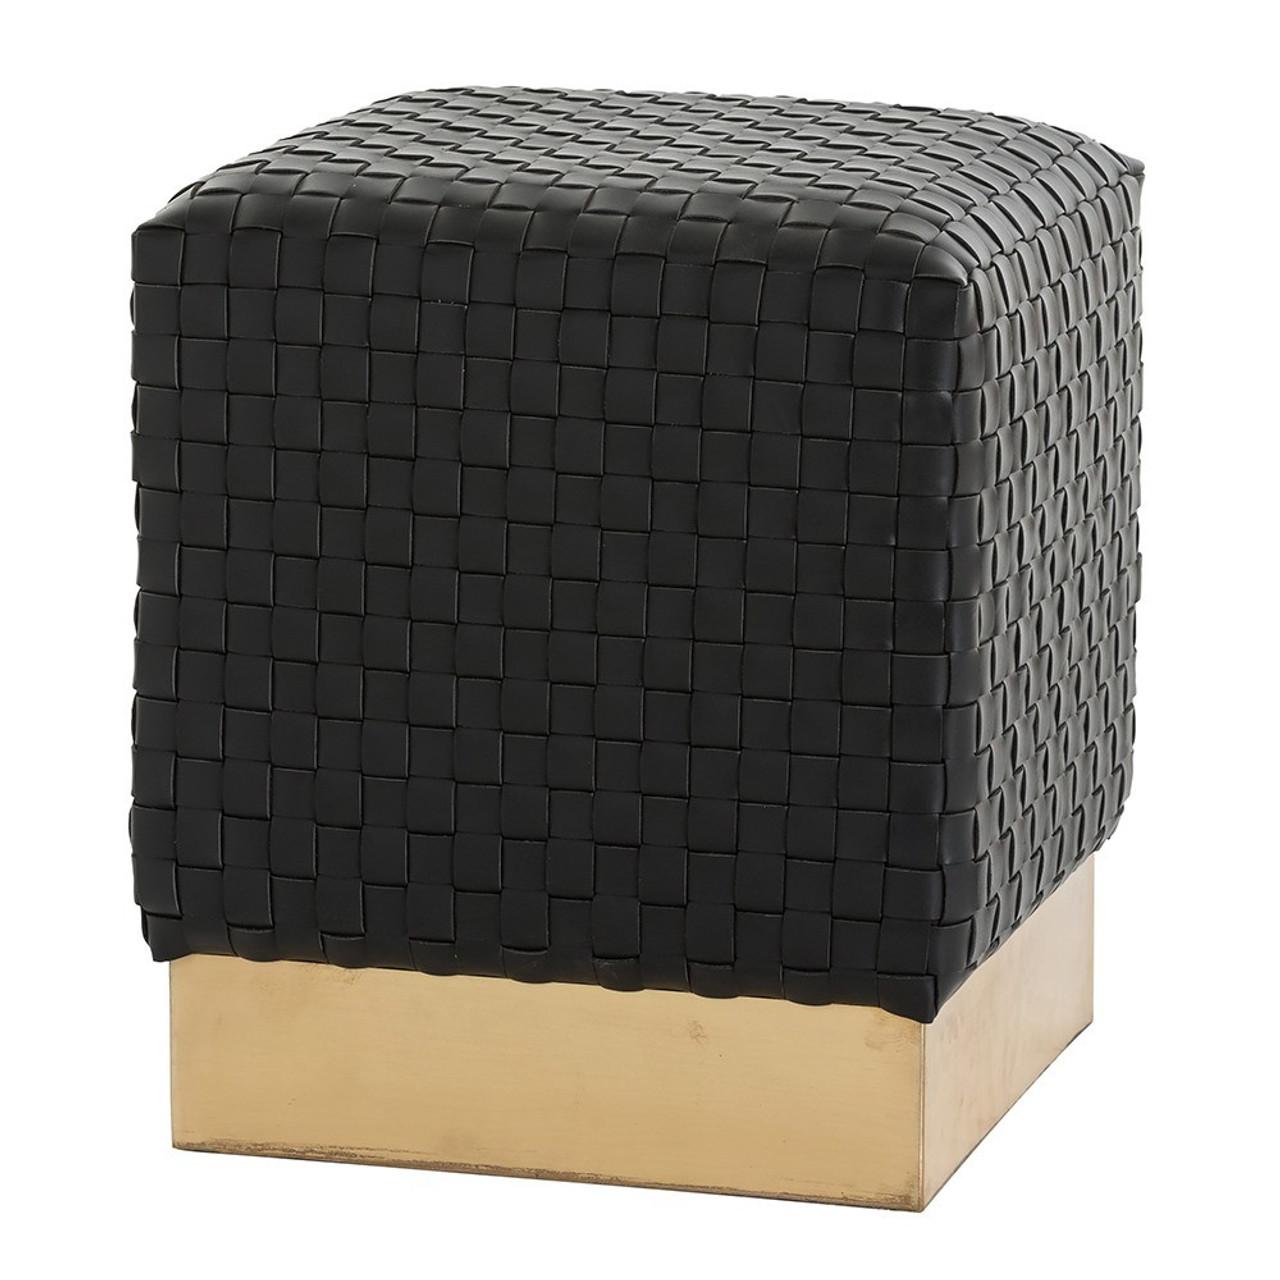 Arteriors, Emmit Black Woven Leather Square Ottoman, 6141